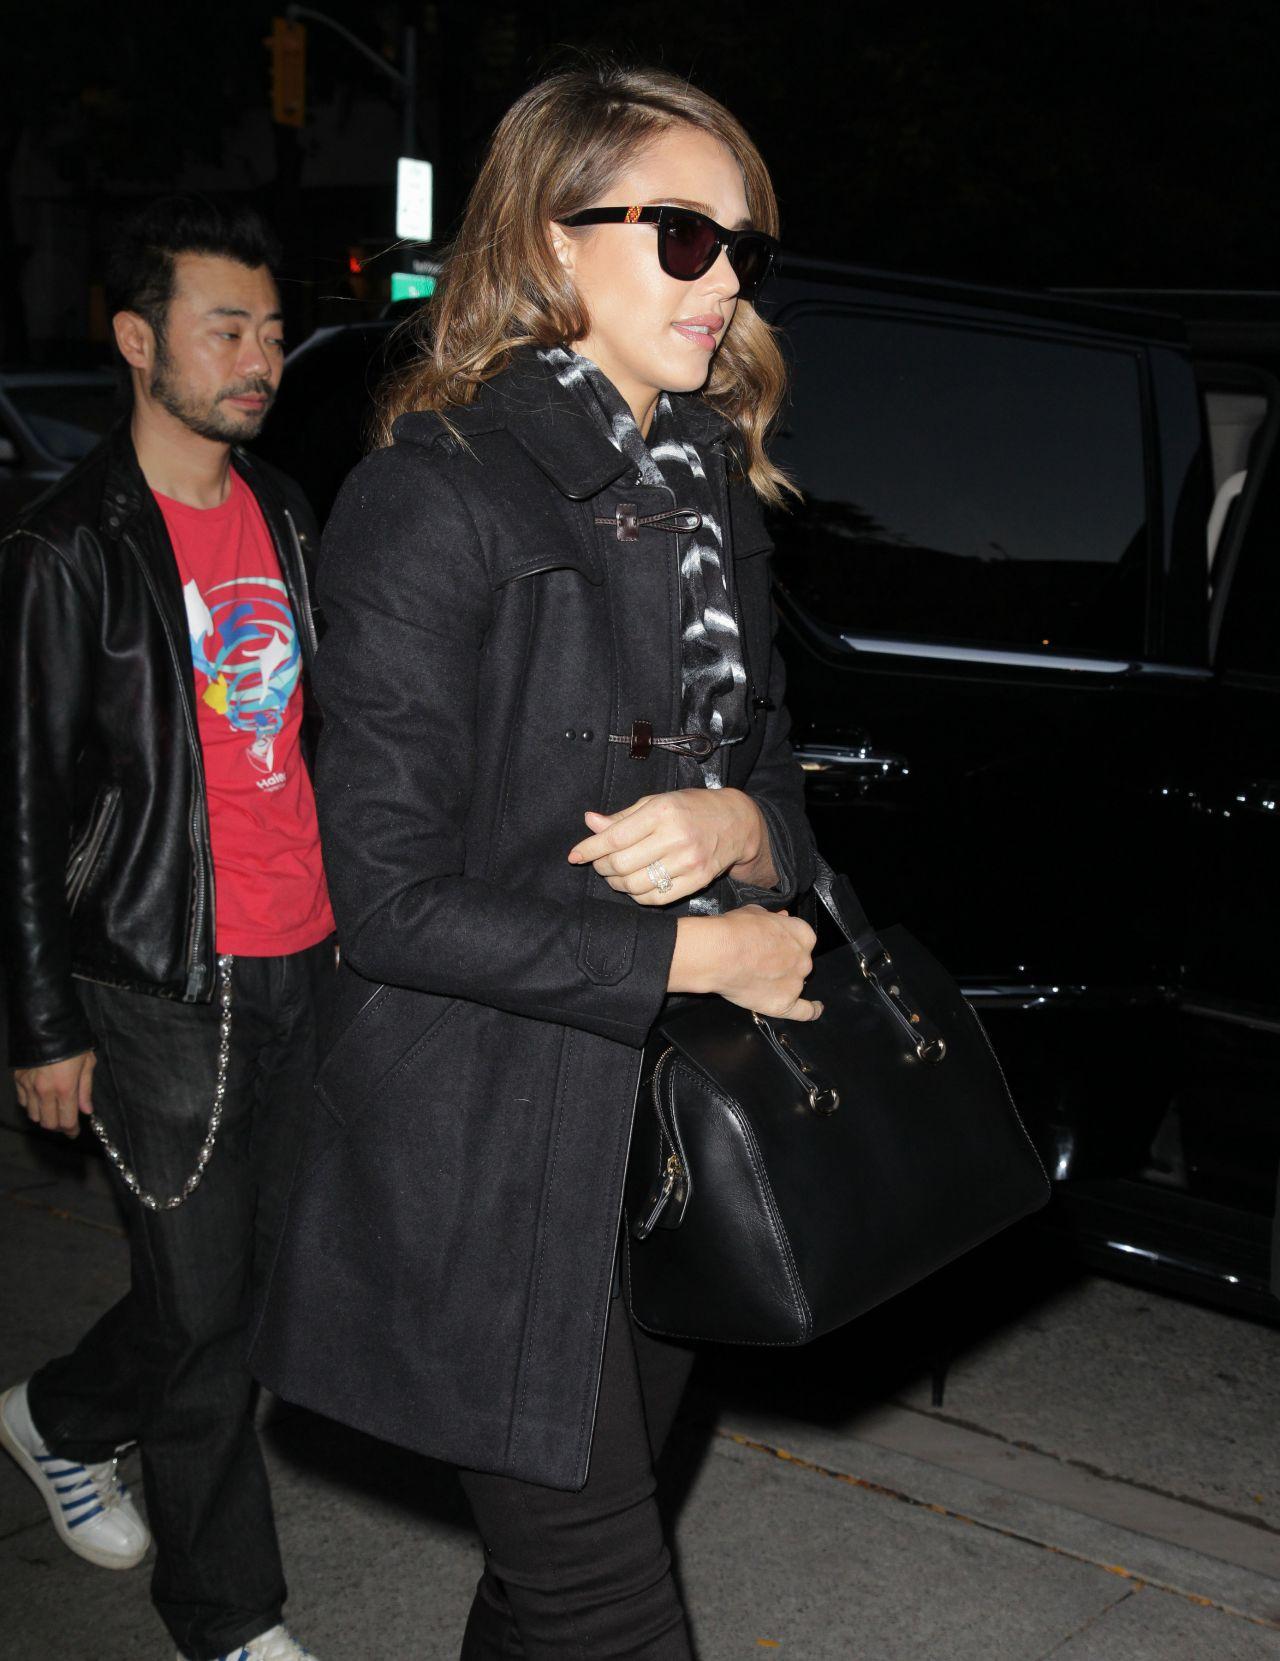 Jessica Alba Arriving at Kiss 92.5 Radio Station in Toronto